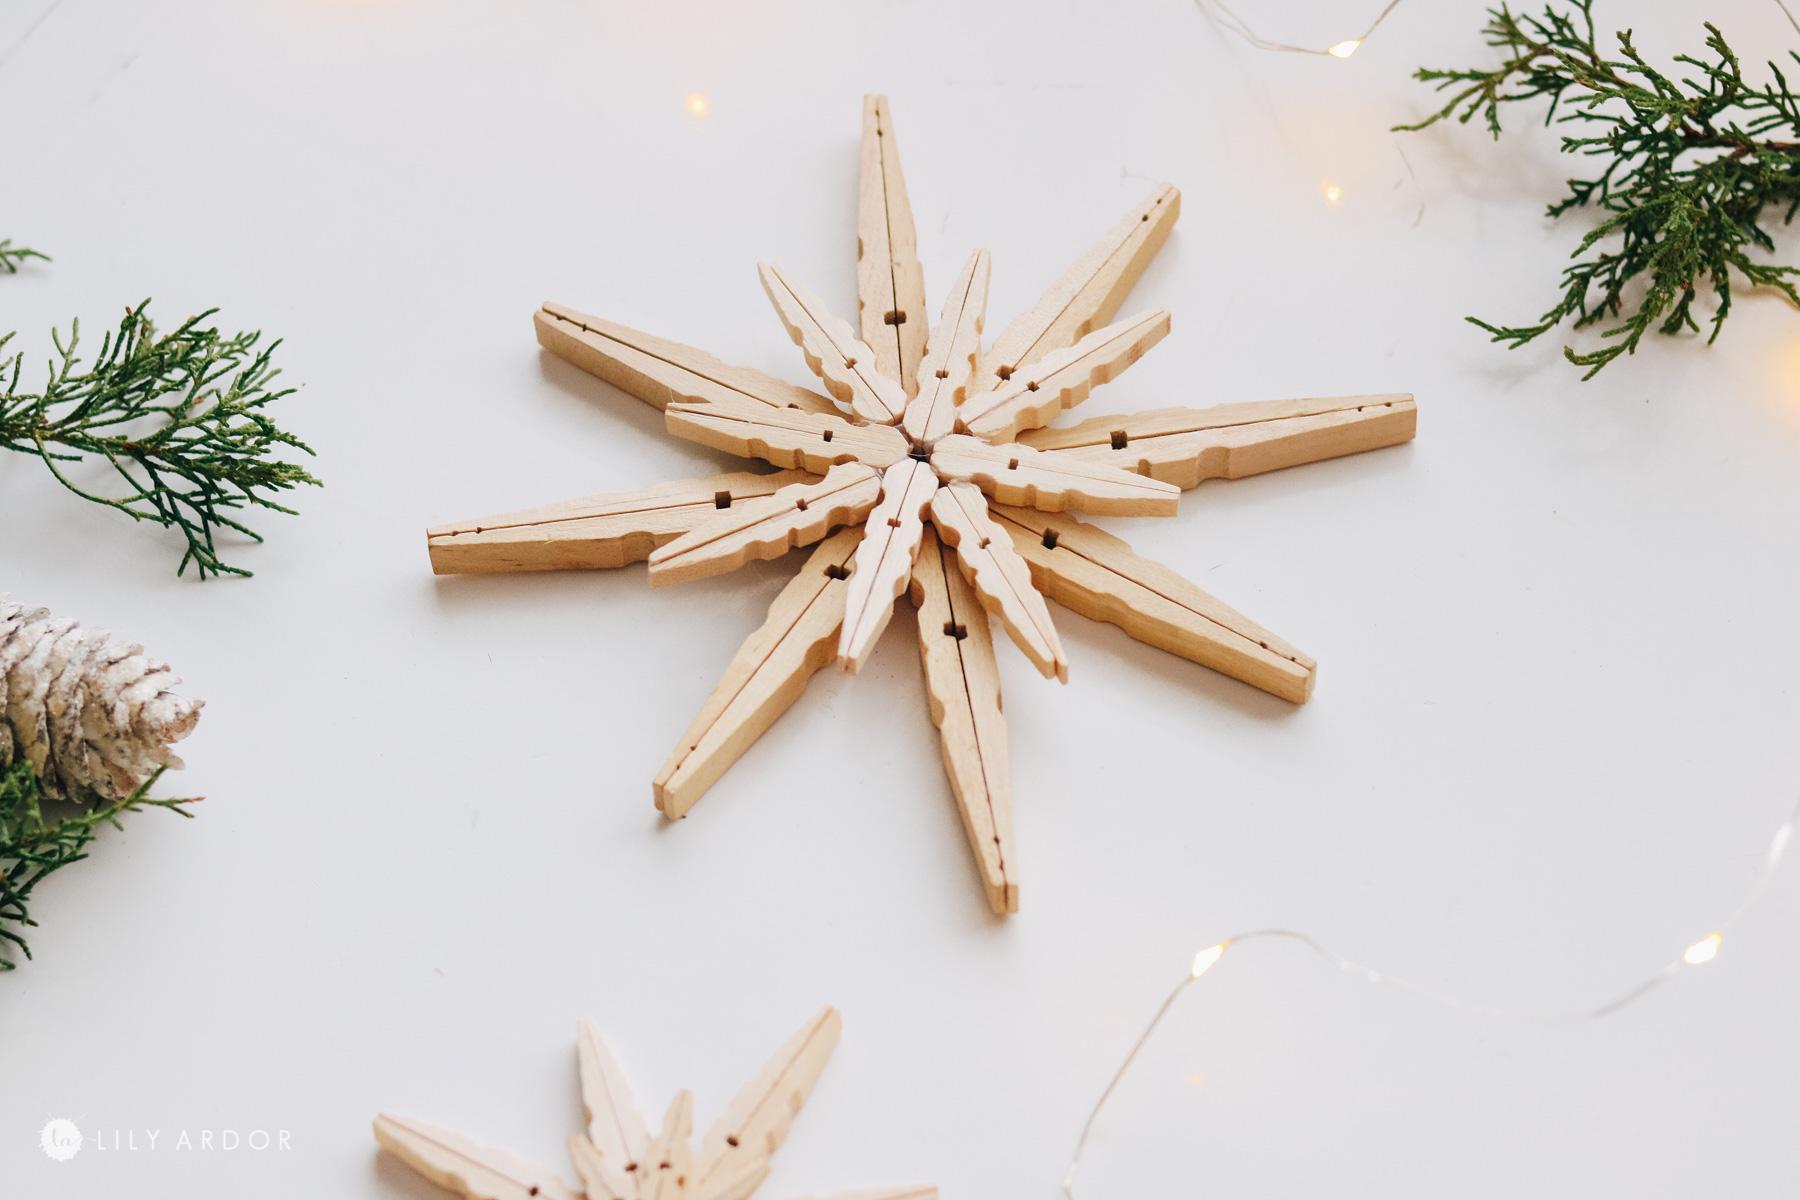 DIY clothespin stars